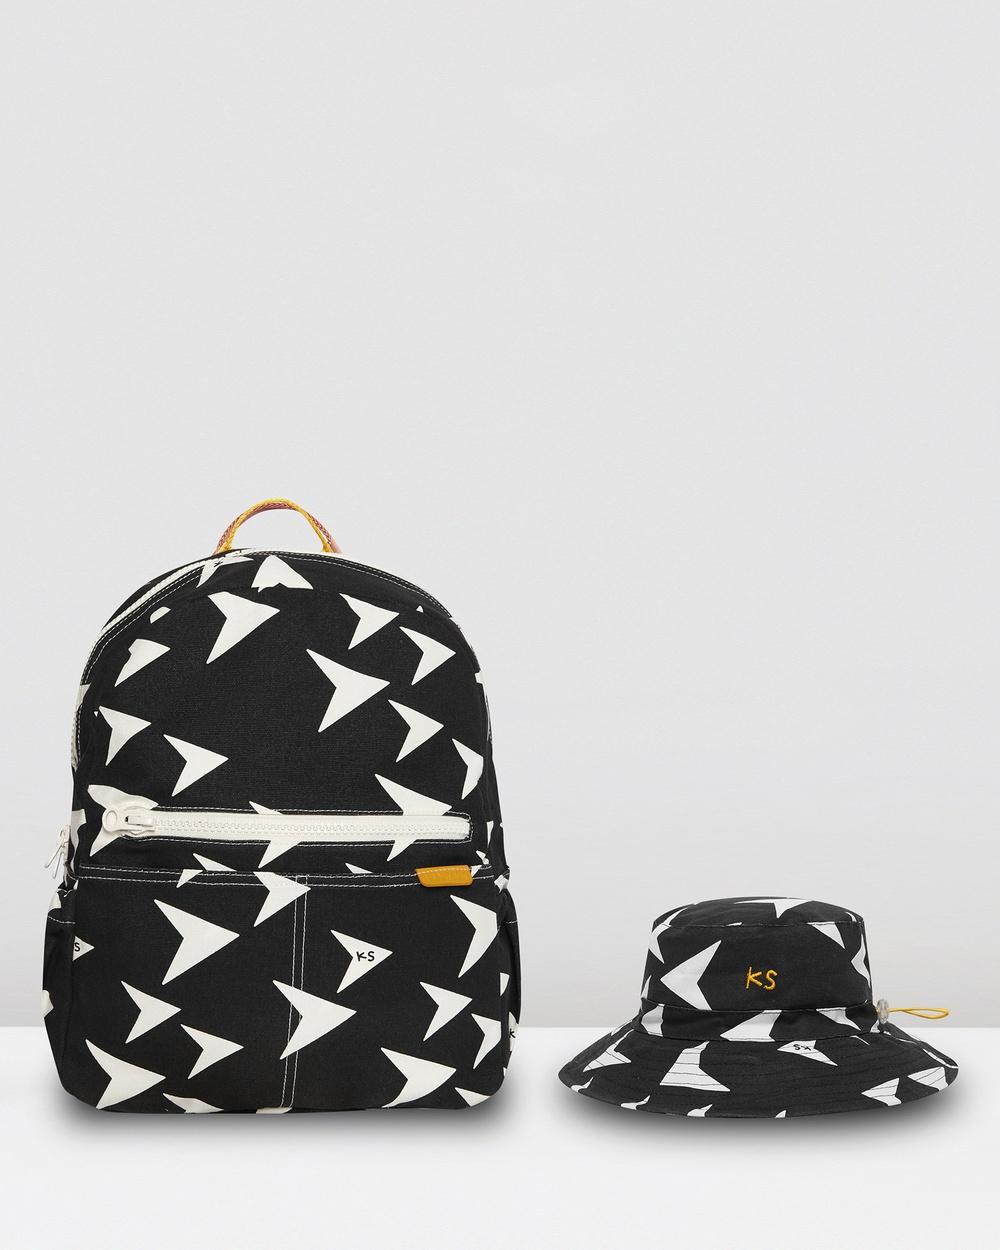 KID STOCK Essentials Bundle Backpacks Charcoal